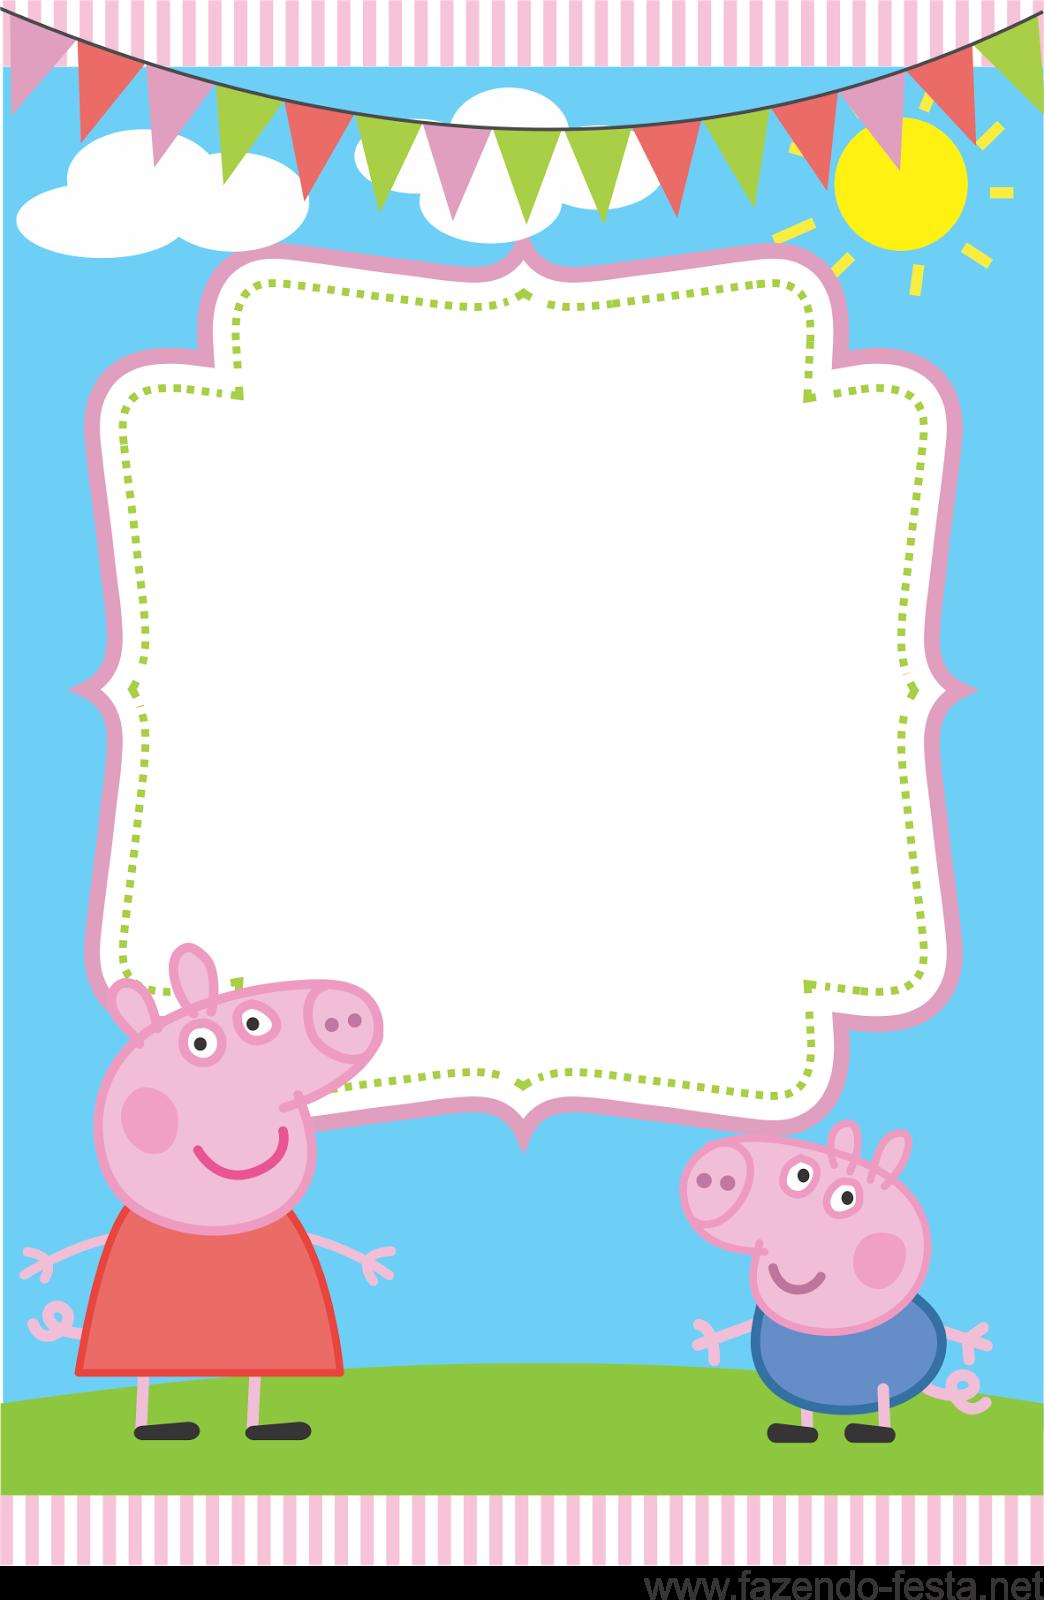 da Peppa Pig para aniversrios Convite da Peppa Pig para imprimir 1044x1600